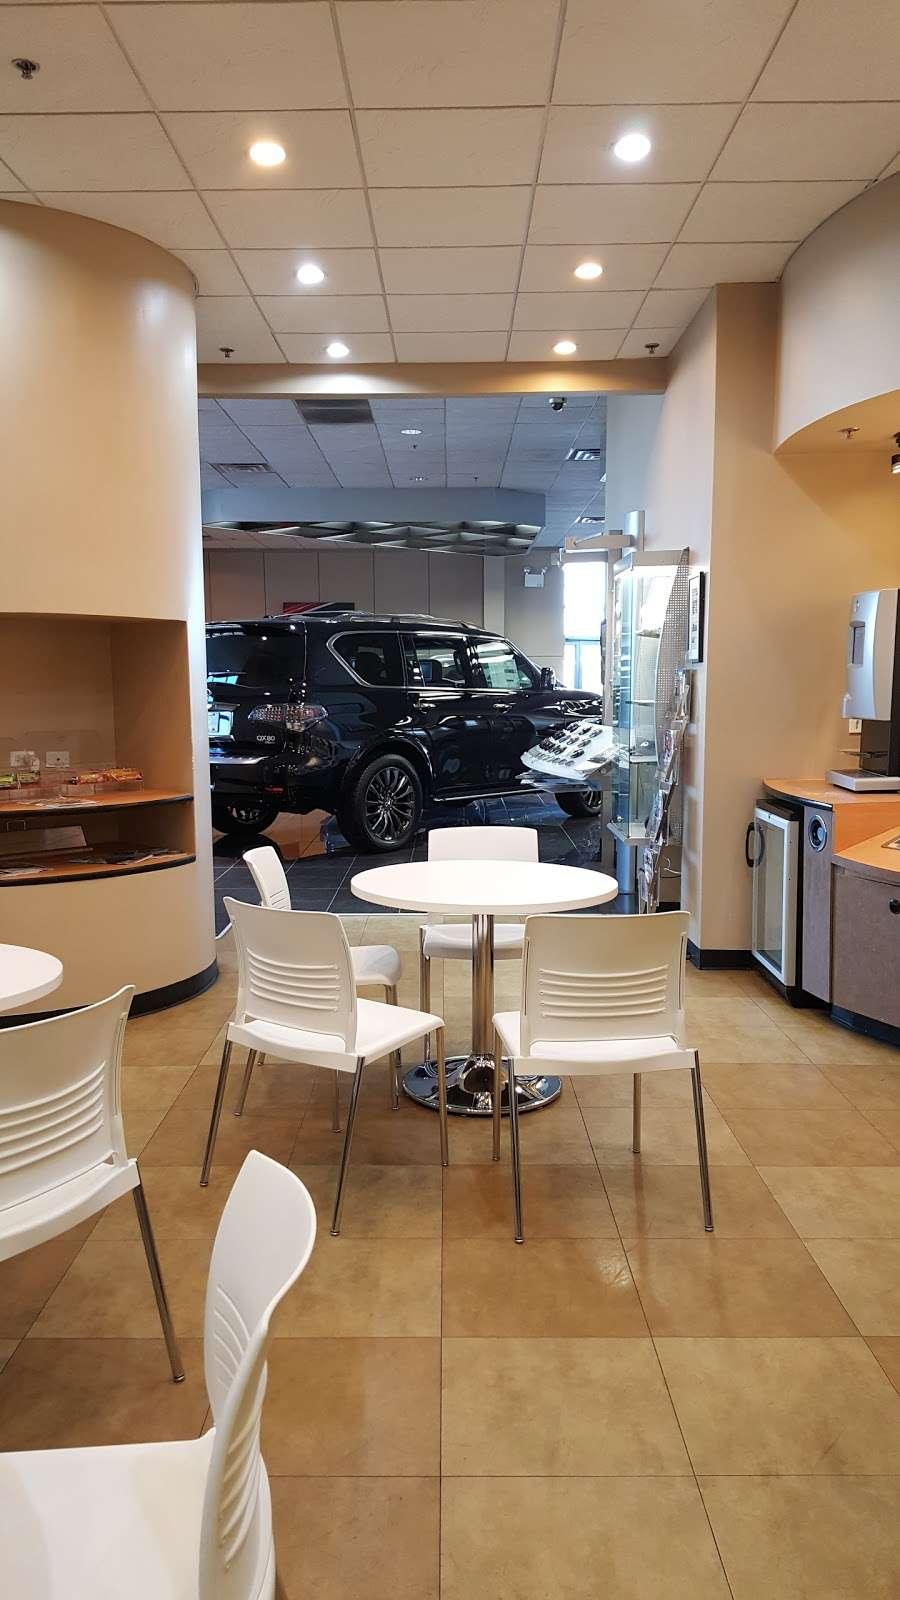 Gregory INFINITI - car dealer  | Photo 1 of 10 | Address: 1121 S Milwaukee Ave, Libertyville, IL 60048, USA | Phone: (847) 362-9200